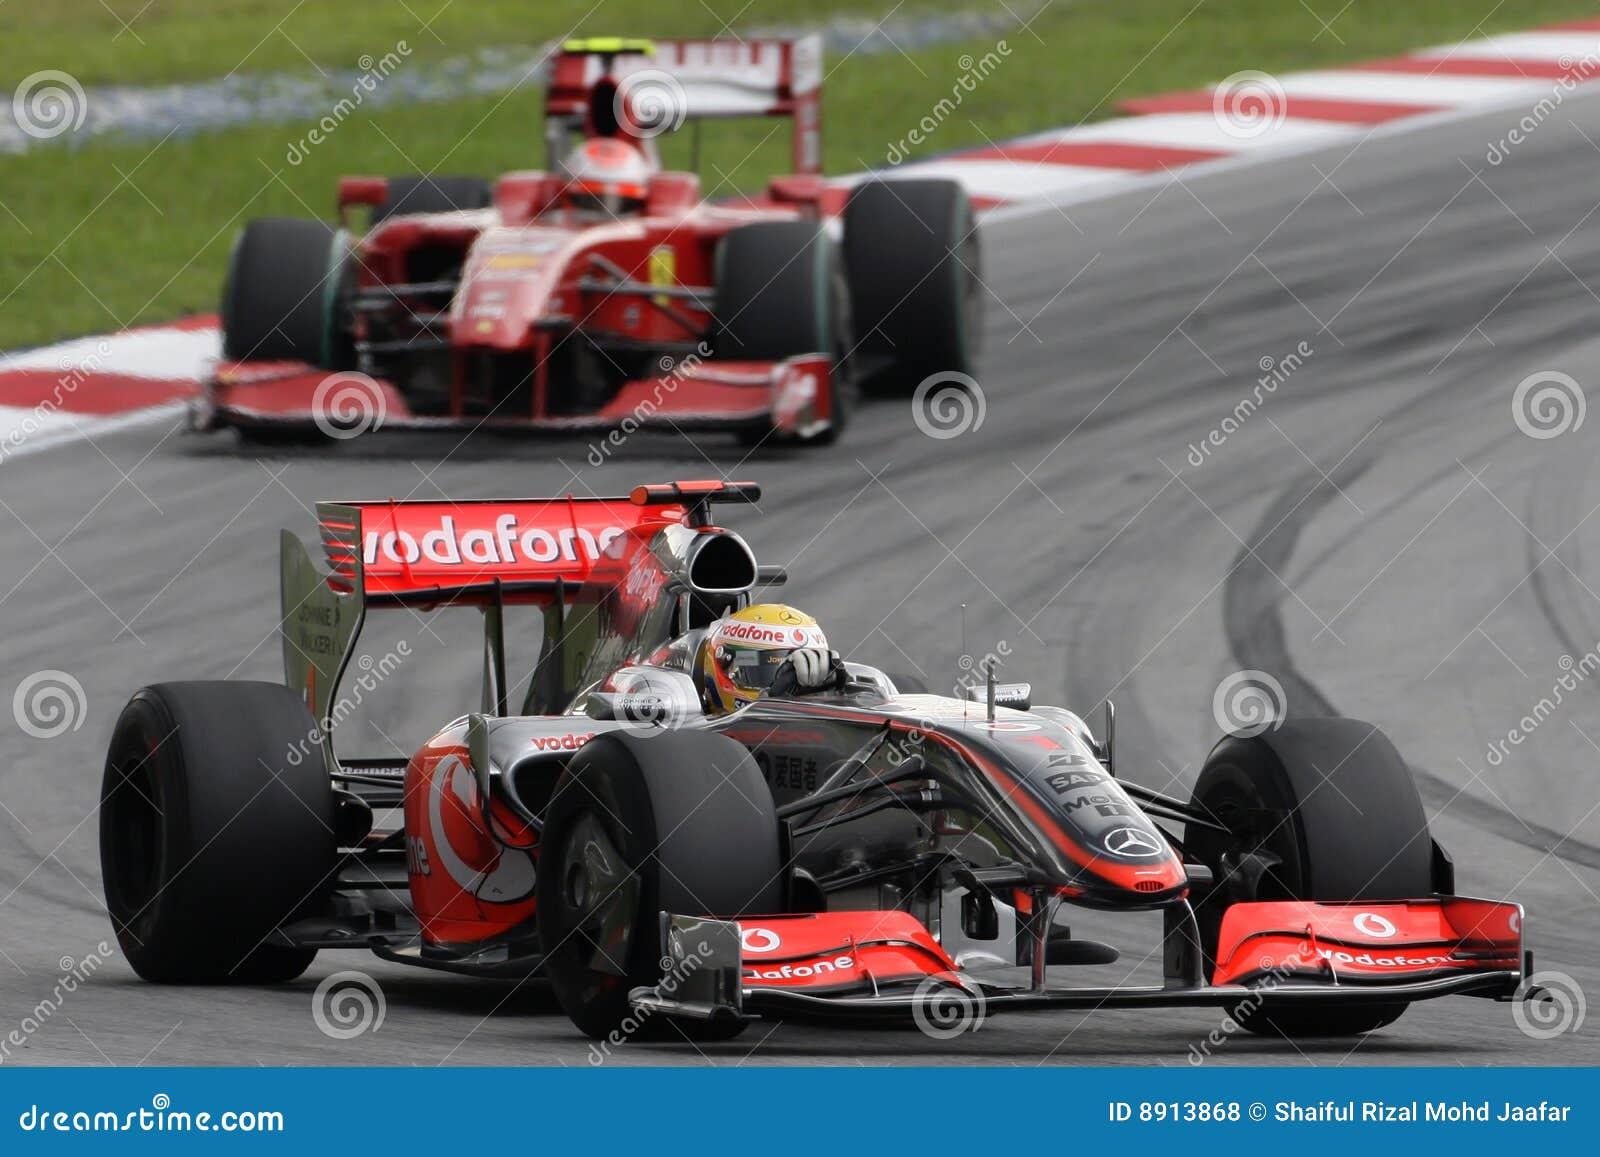 2009 f1 hamilton lewis mclaren команда mercedes